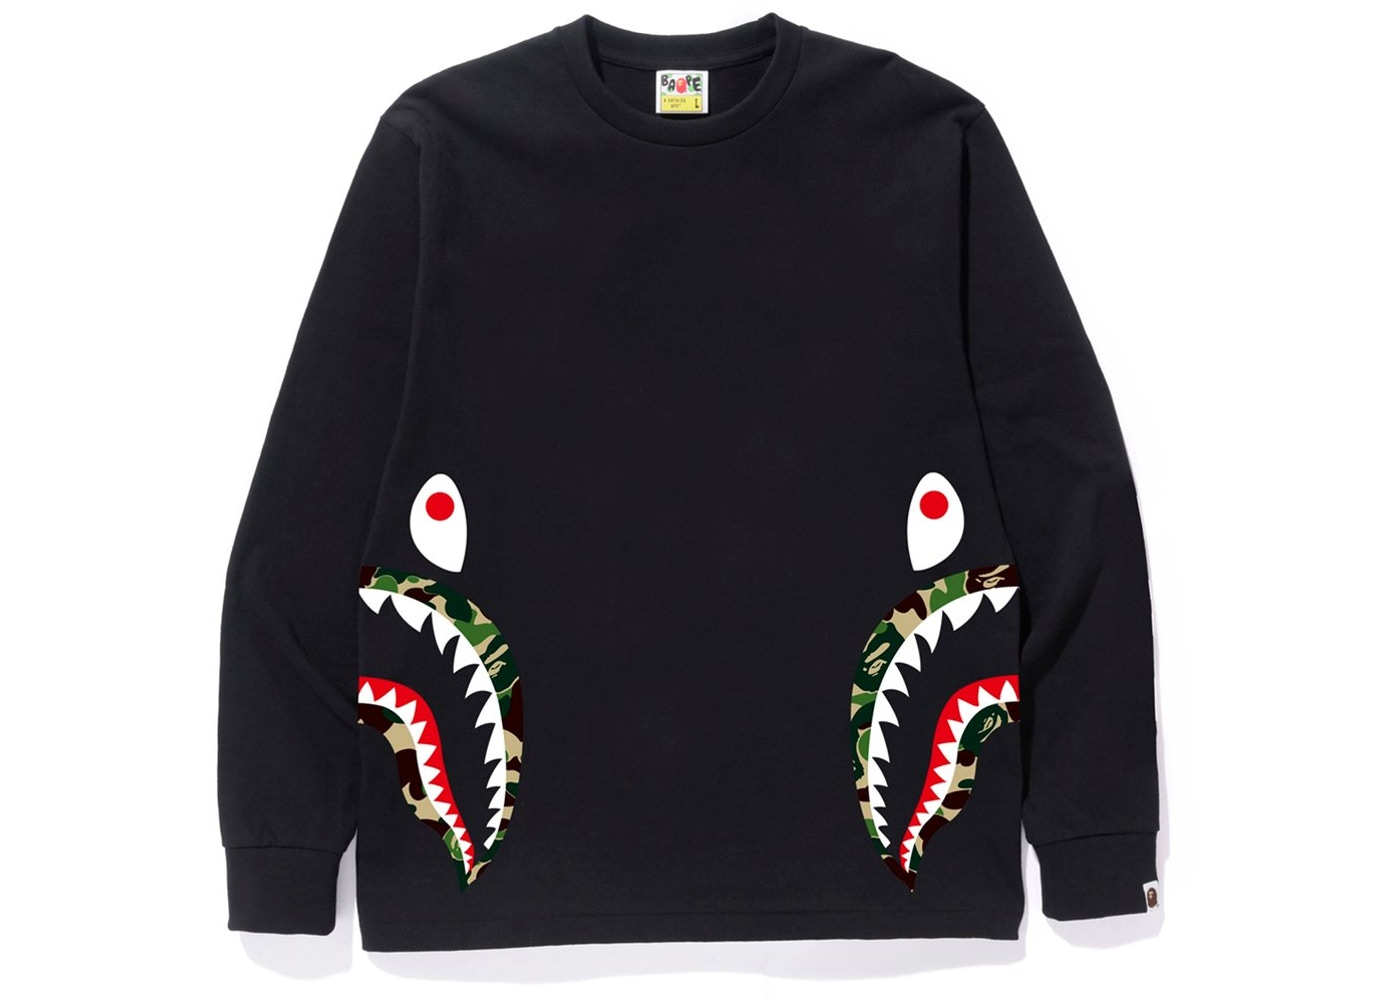 c77c8a61 Streetwear - Bape T-Shirts - New Highest Bids